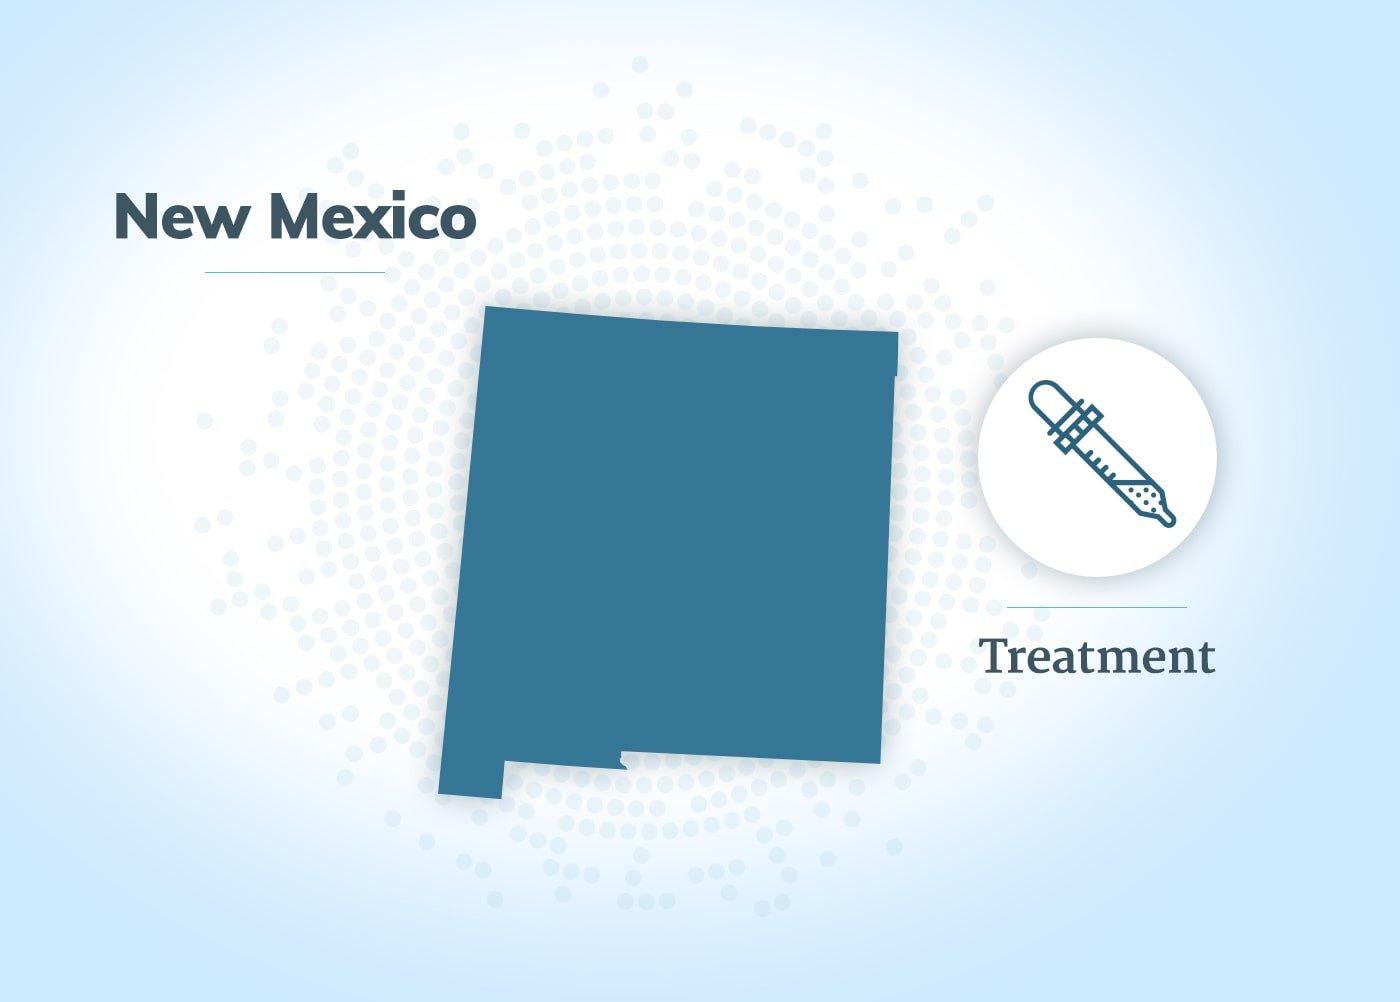 Mesothelioma treatment in New Mexico